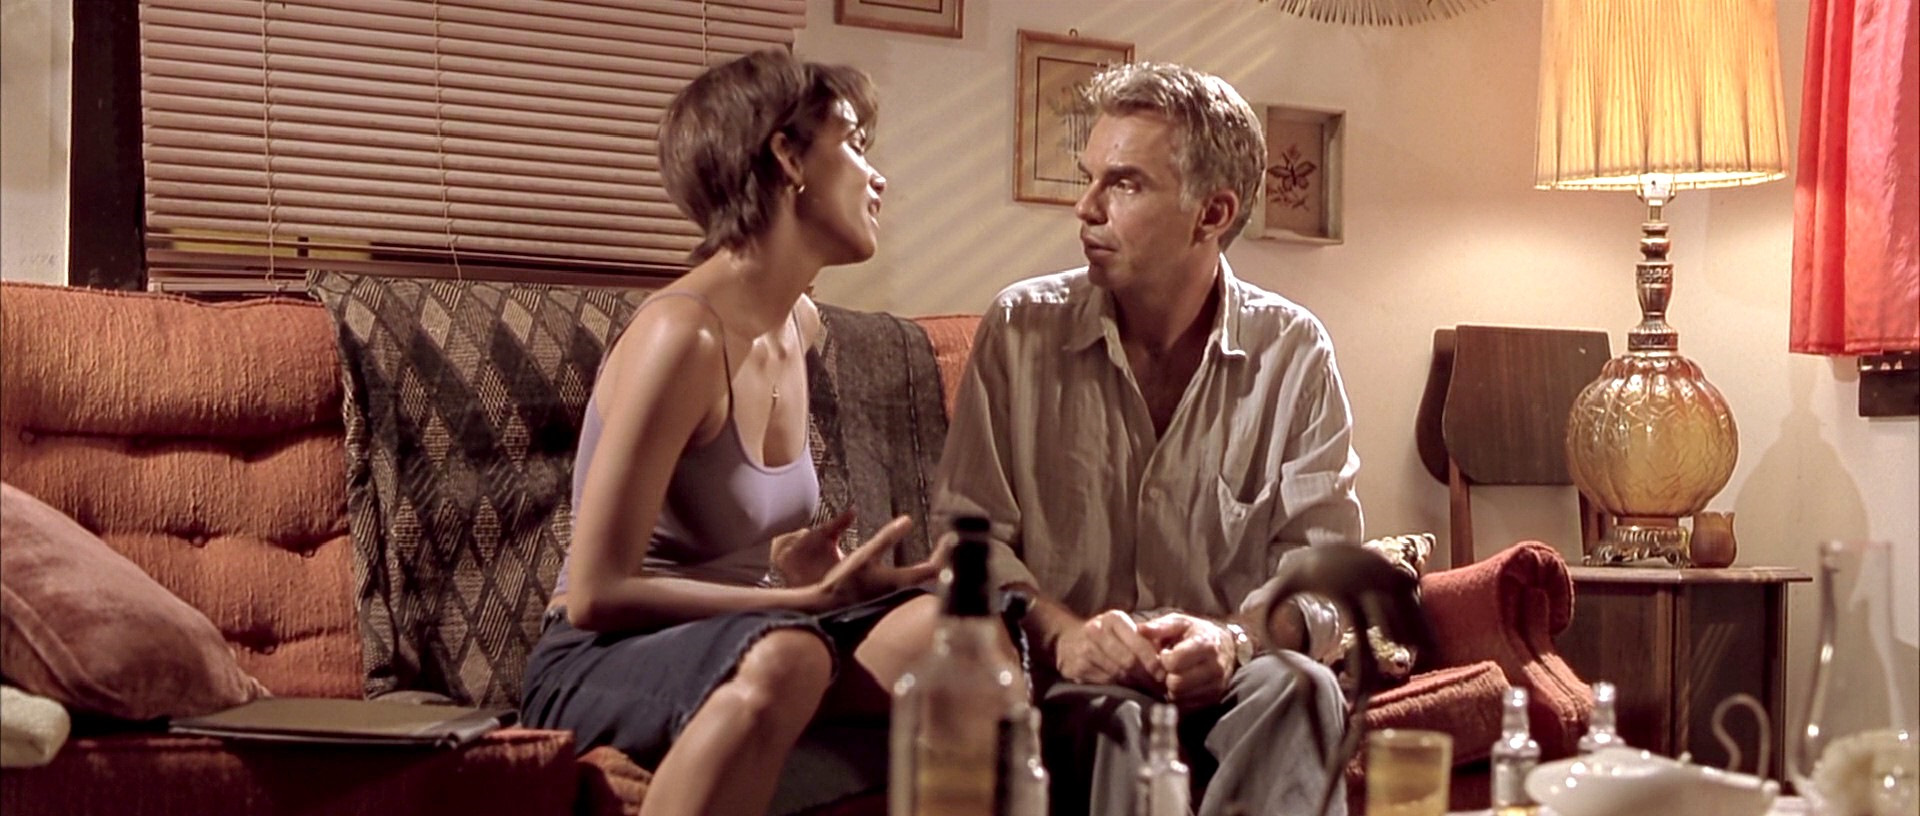 секс сцена с холли берри бар монстров